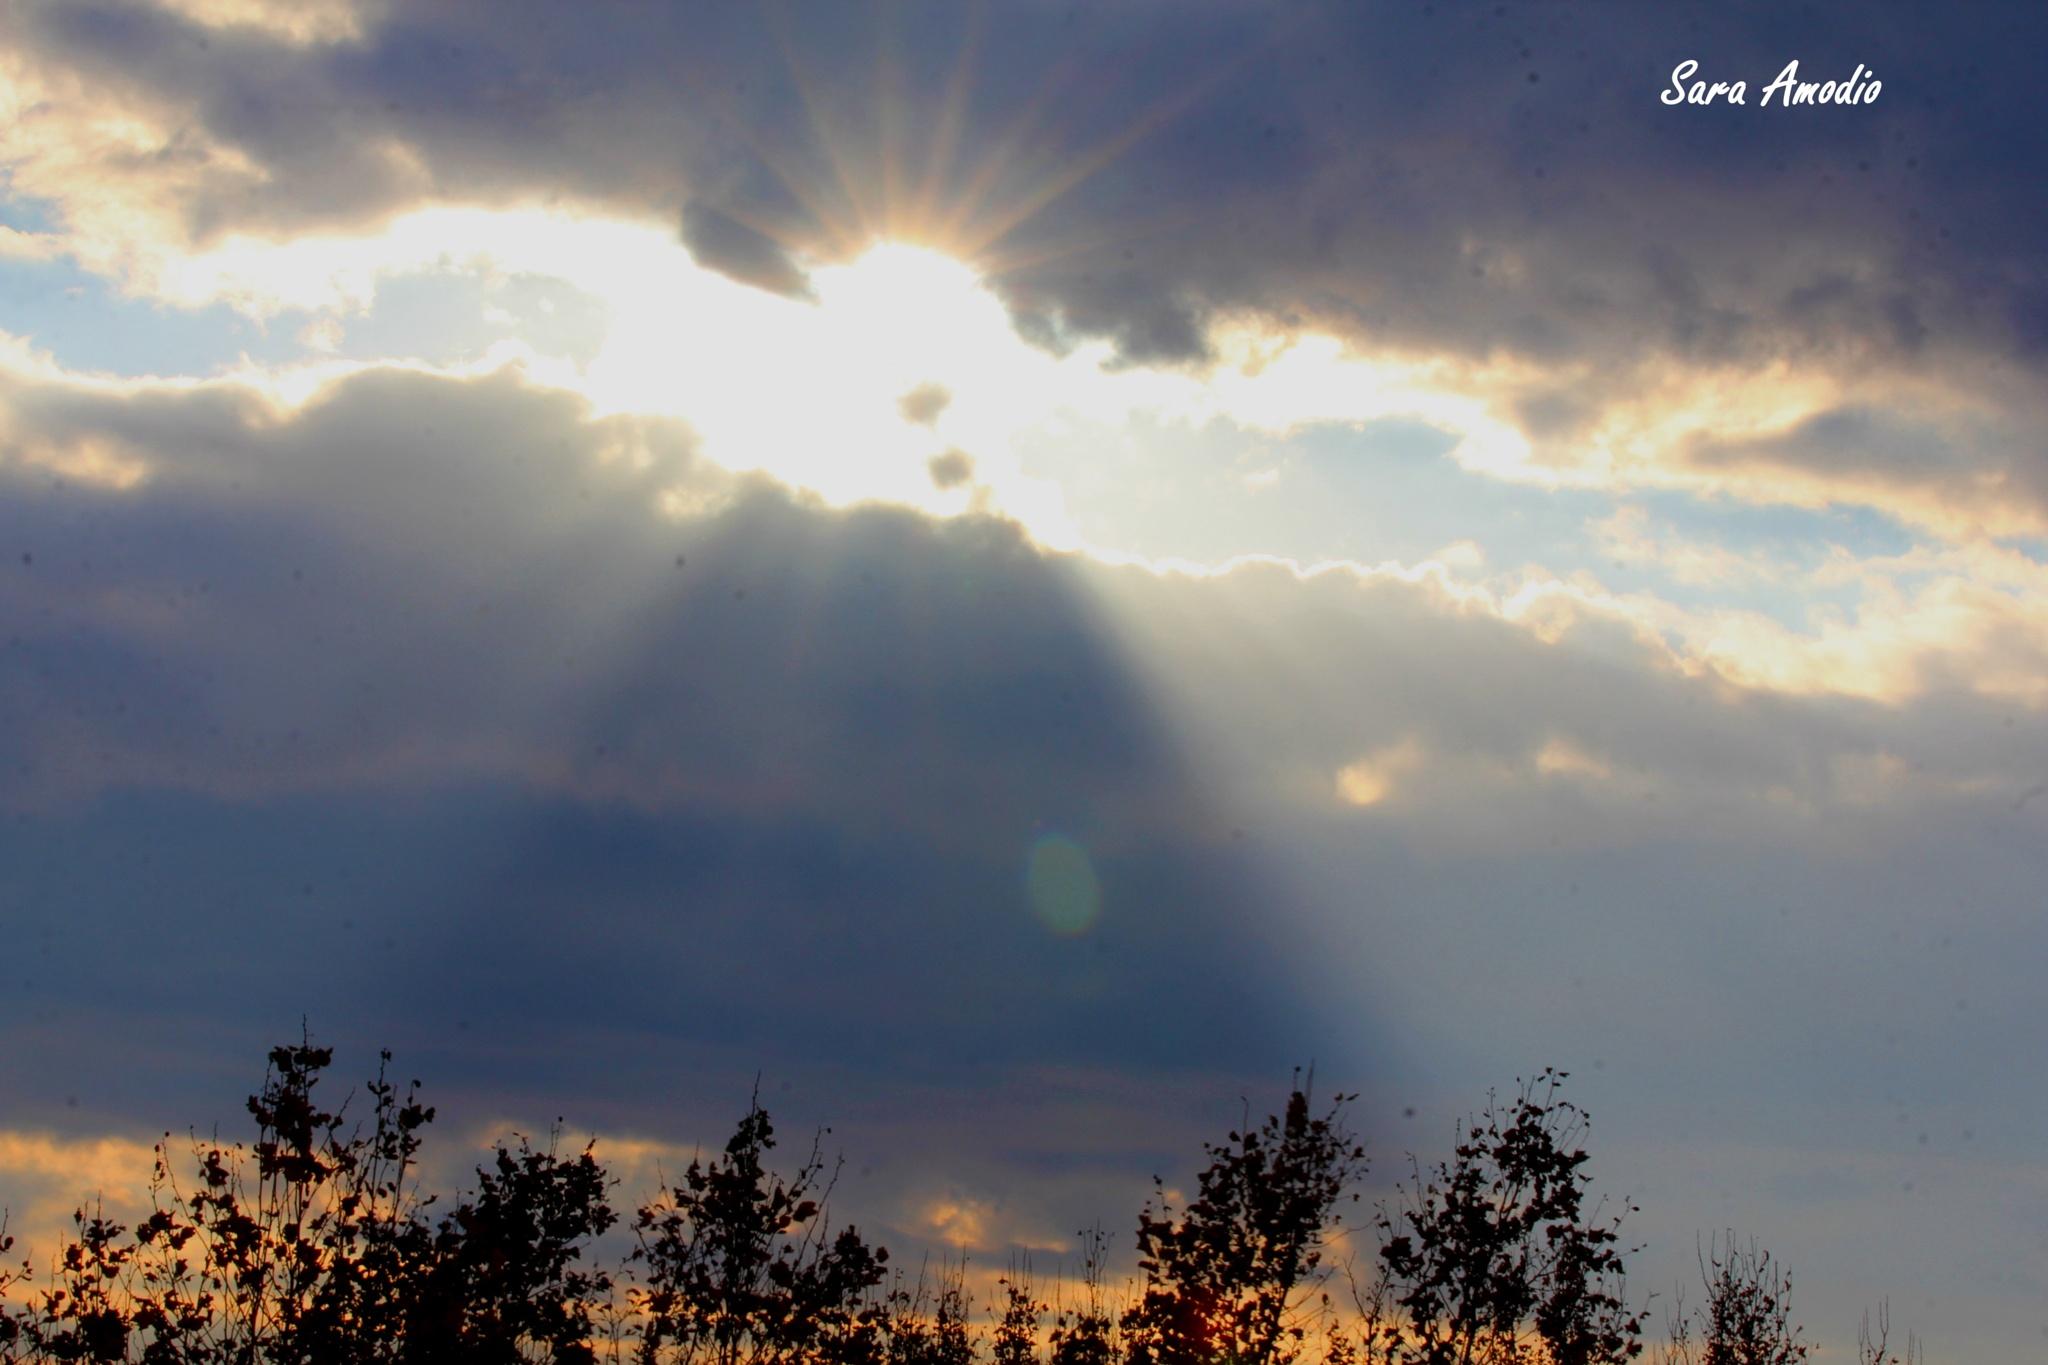 trapped sun by sara.amodio.77